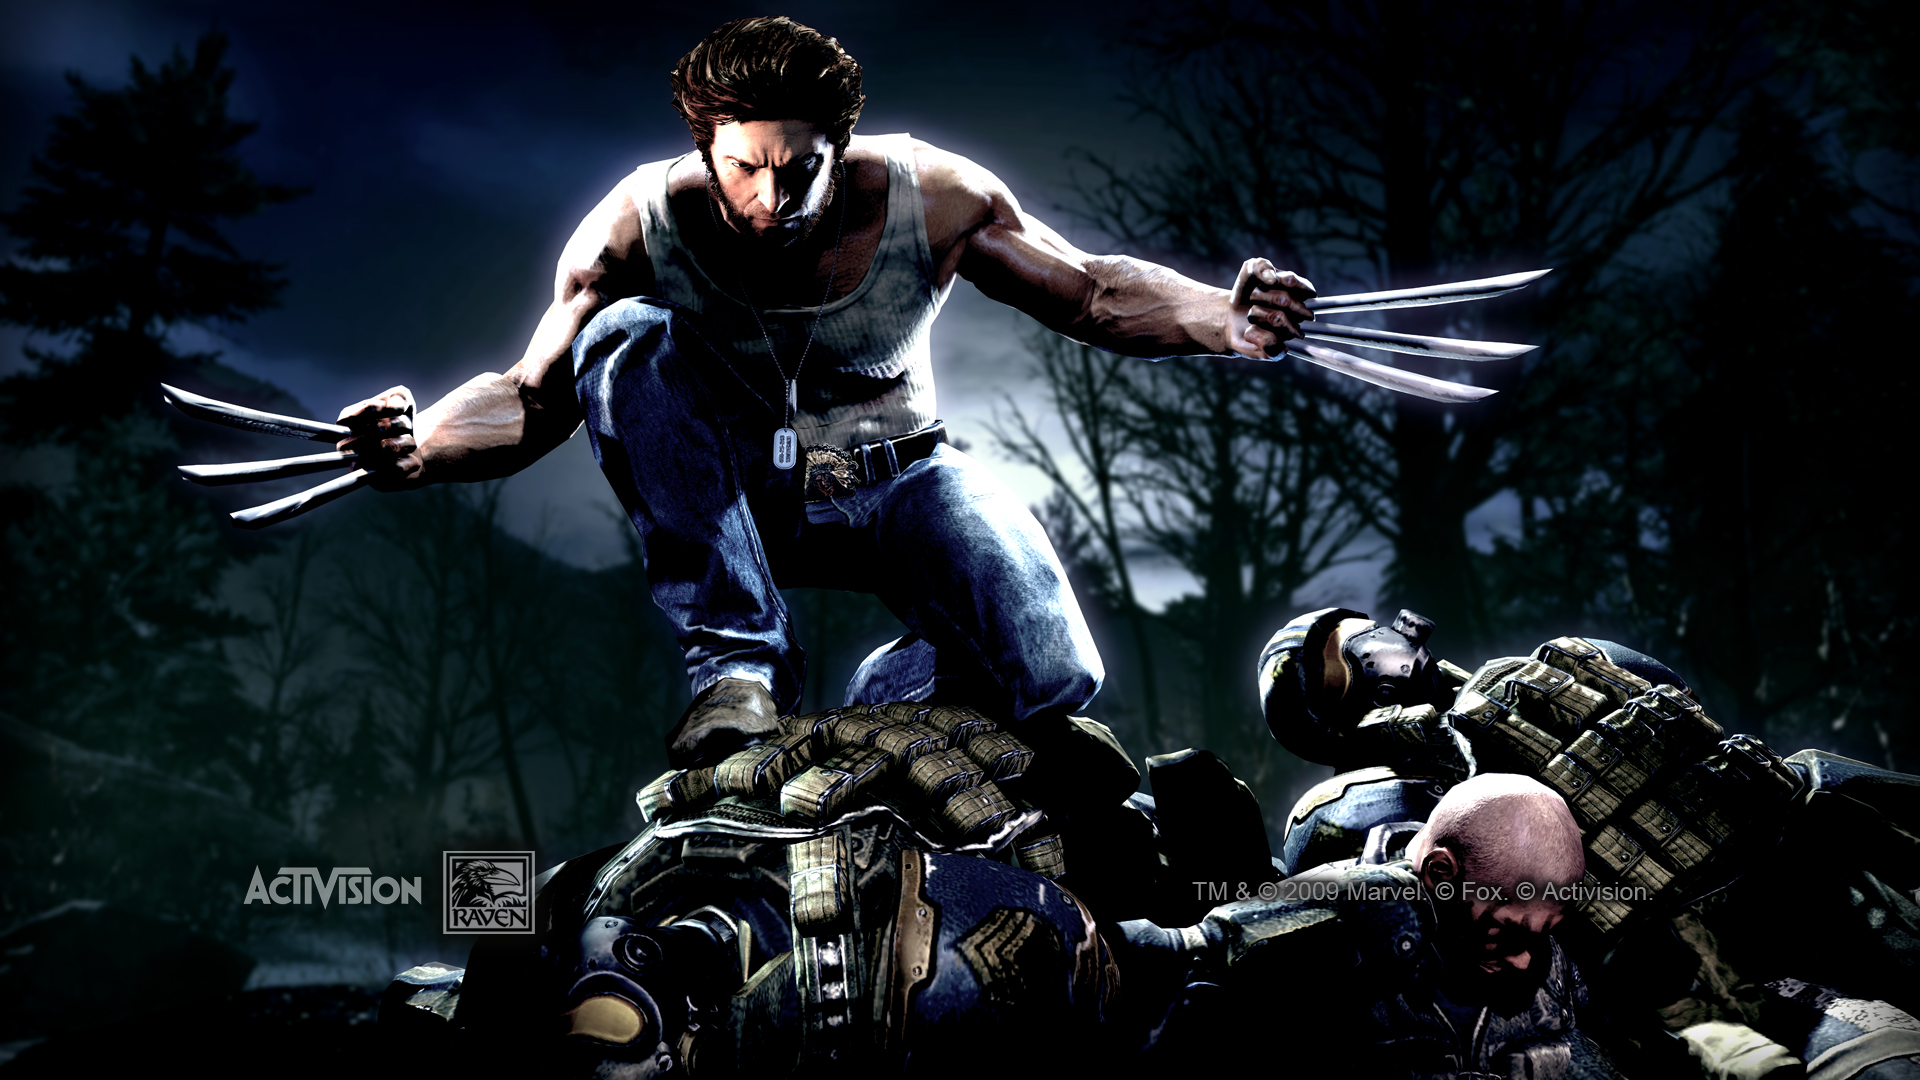 X Men Origins Wolverine Game wallpaper 87911 1920x1080